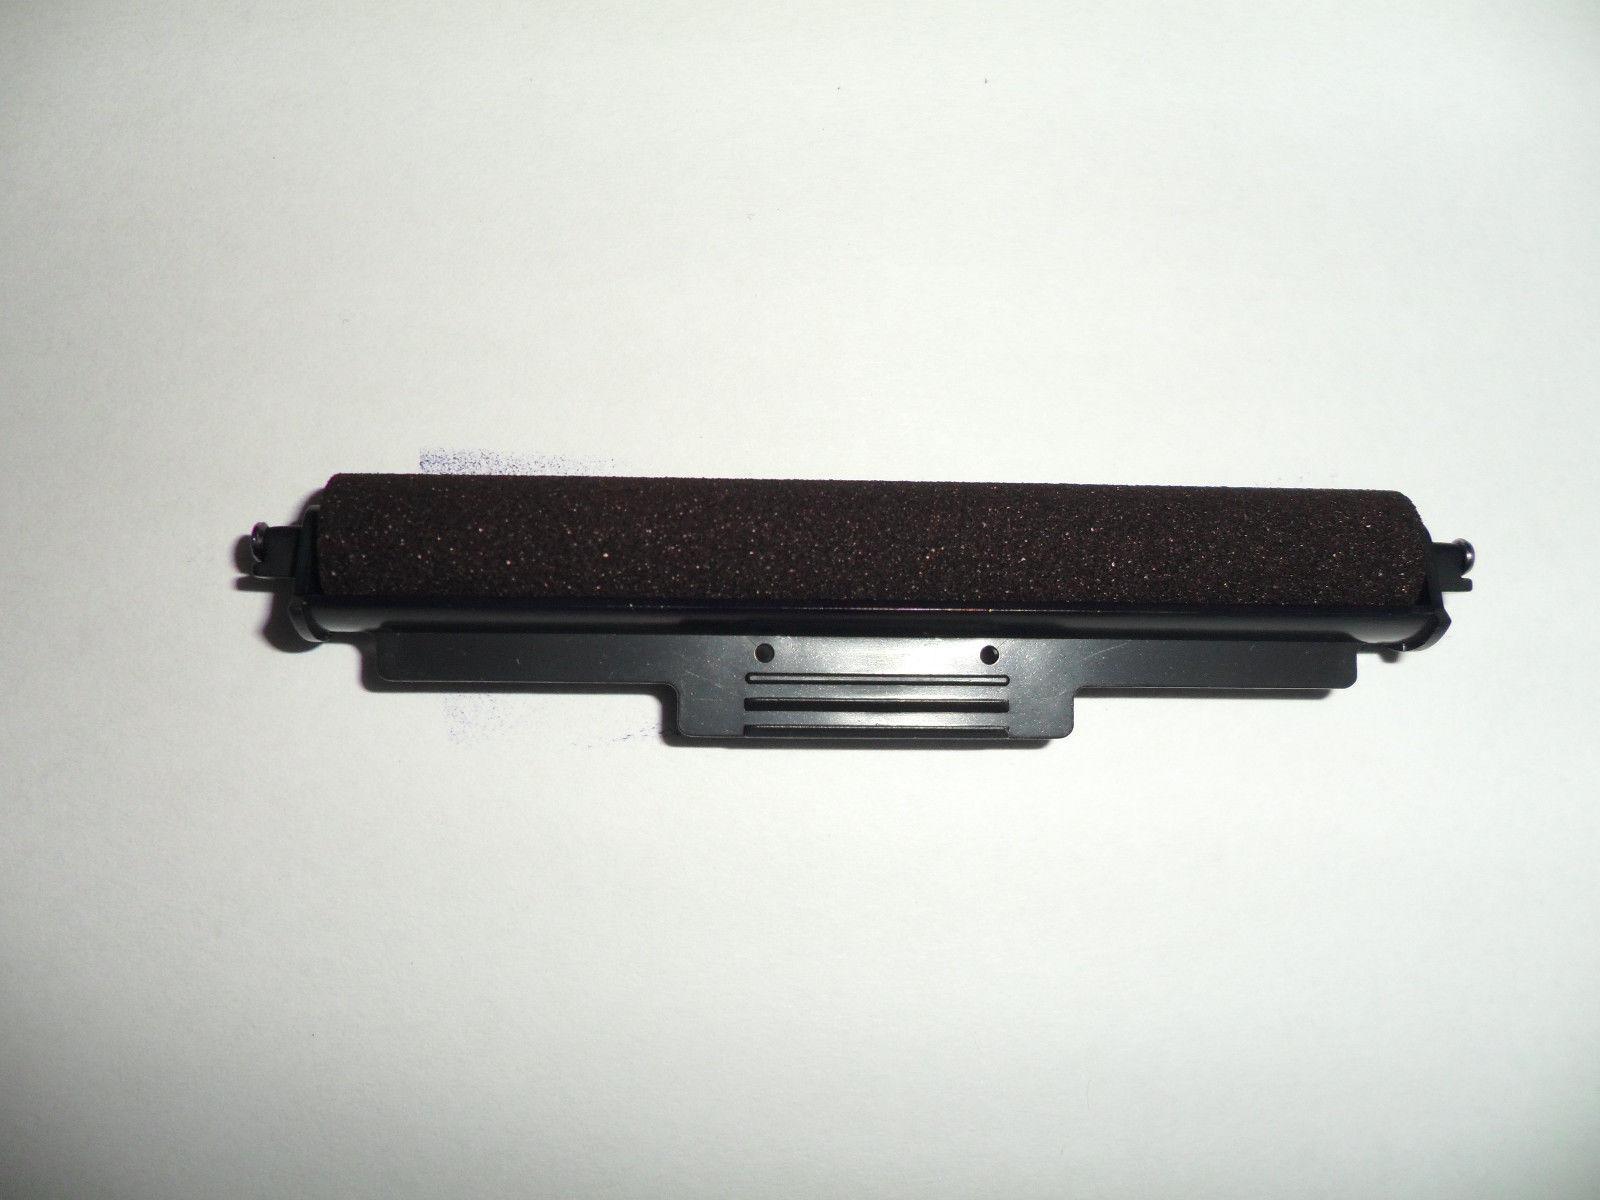 Swintec SW2140 Cash Register Ink Roller (2 Pack) IR93 NR104